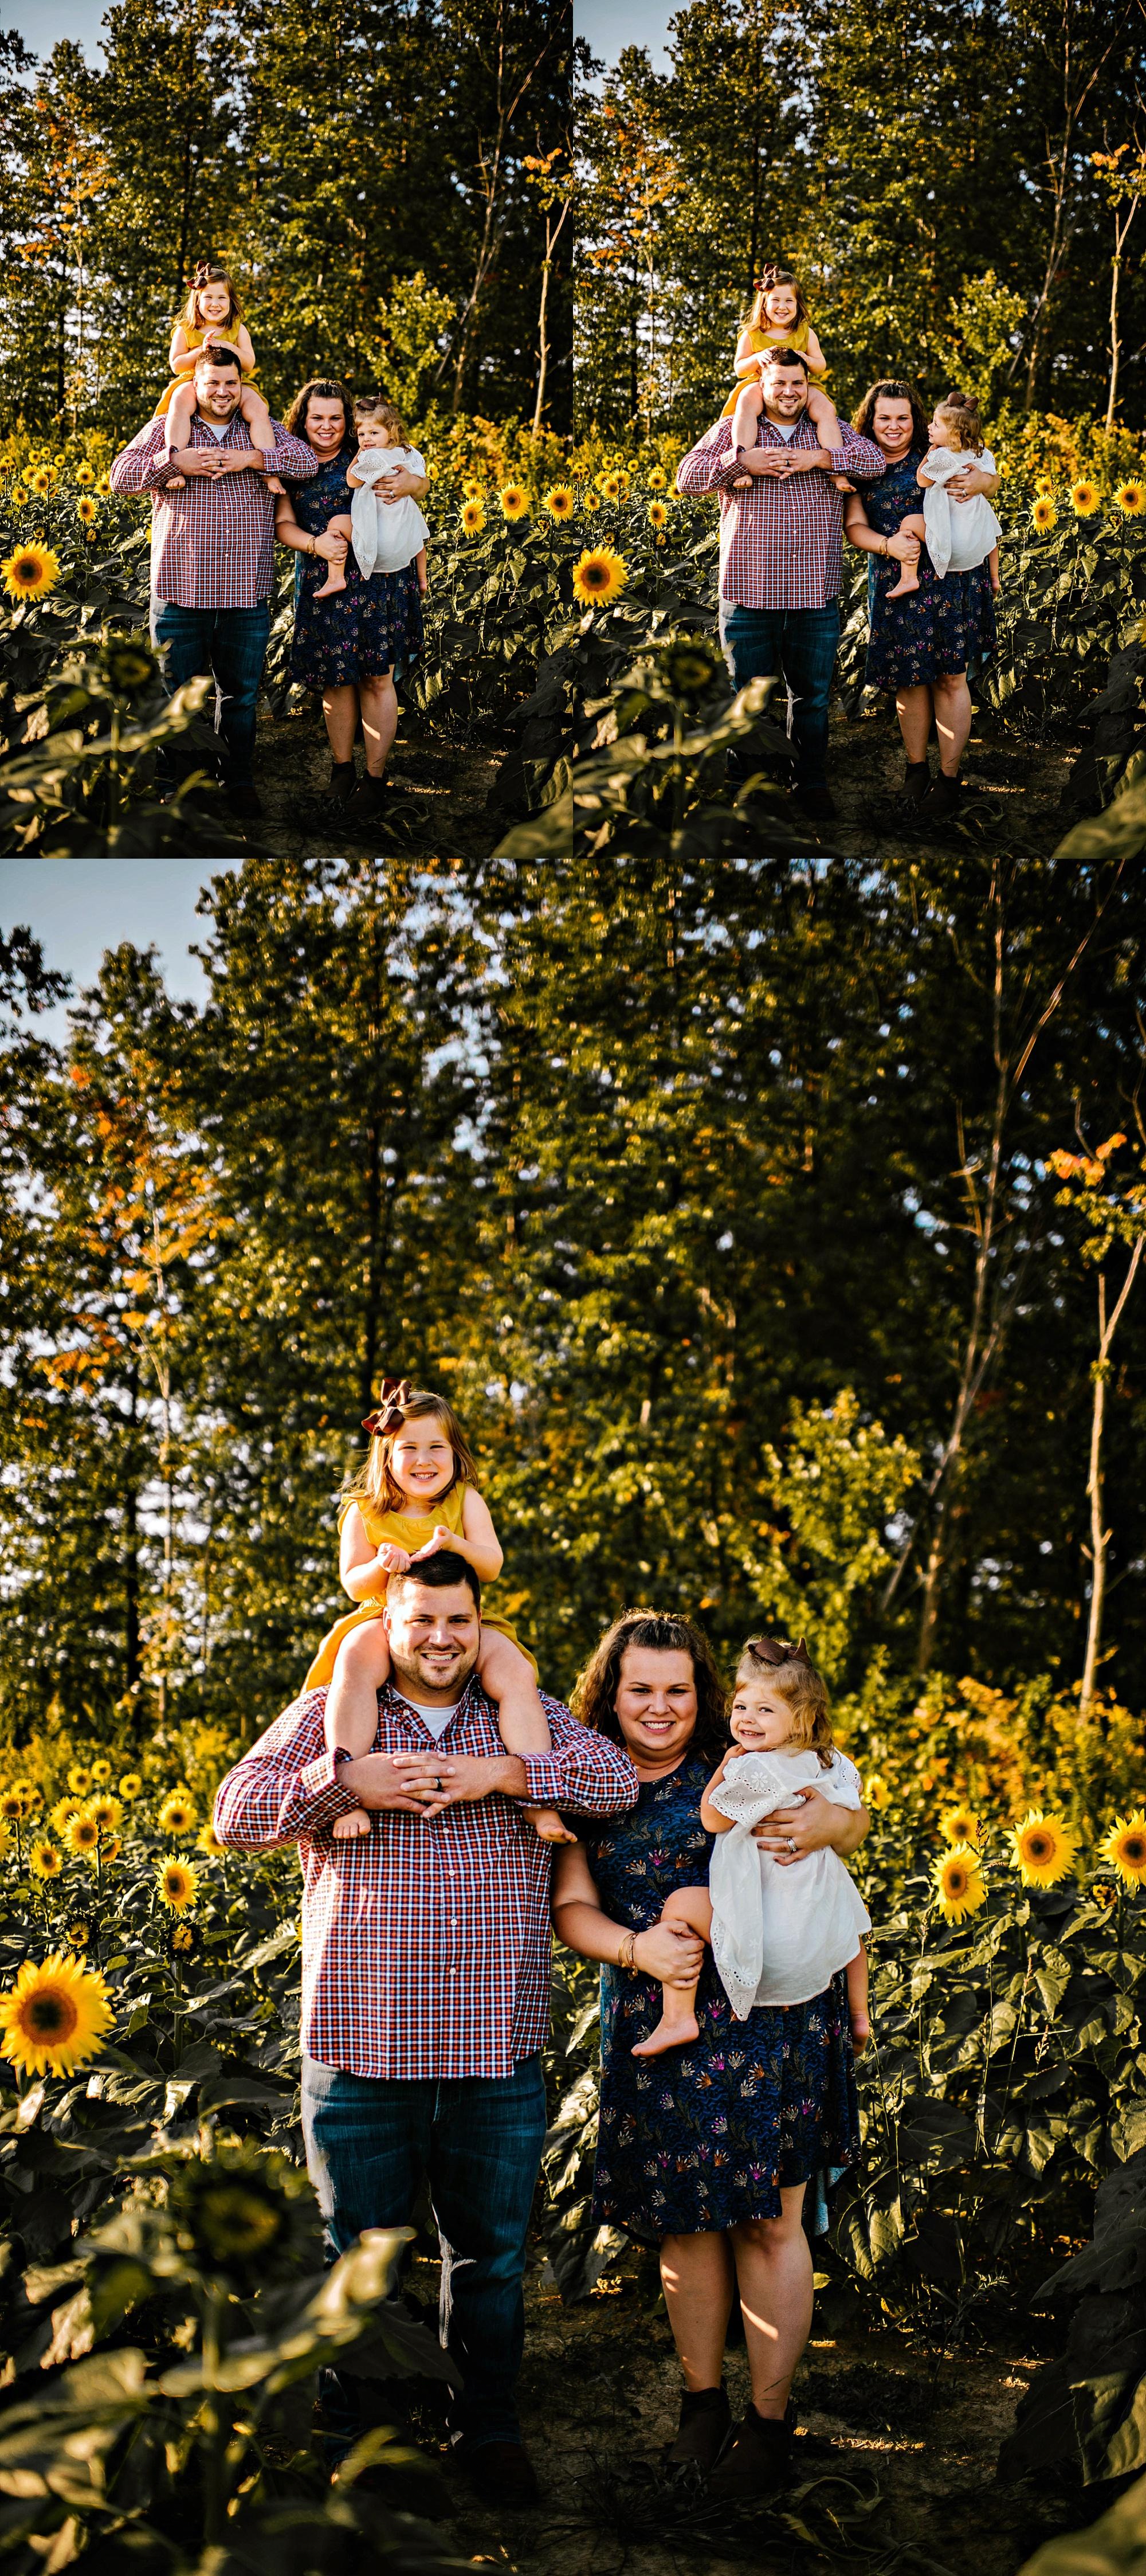 Rutherford-family-cleveland-photographer-lauren-grayson-sunflower-field-session_0031.jpg